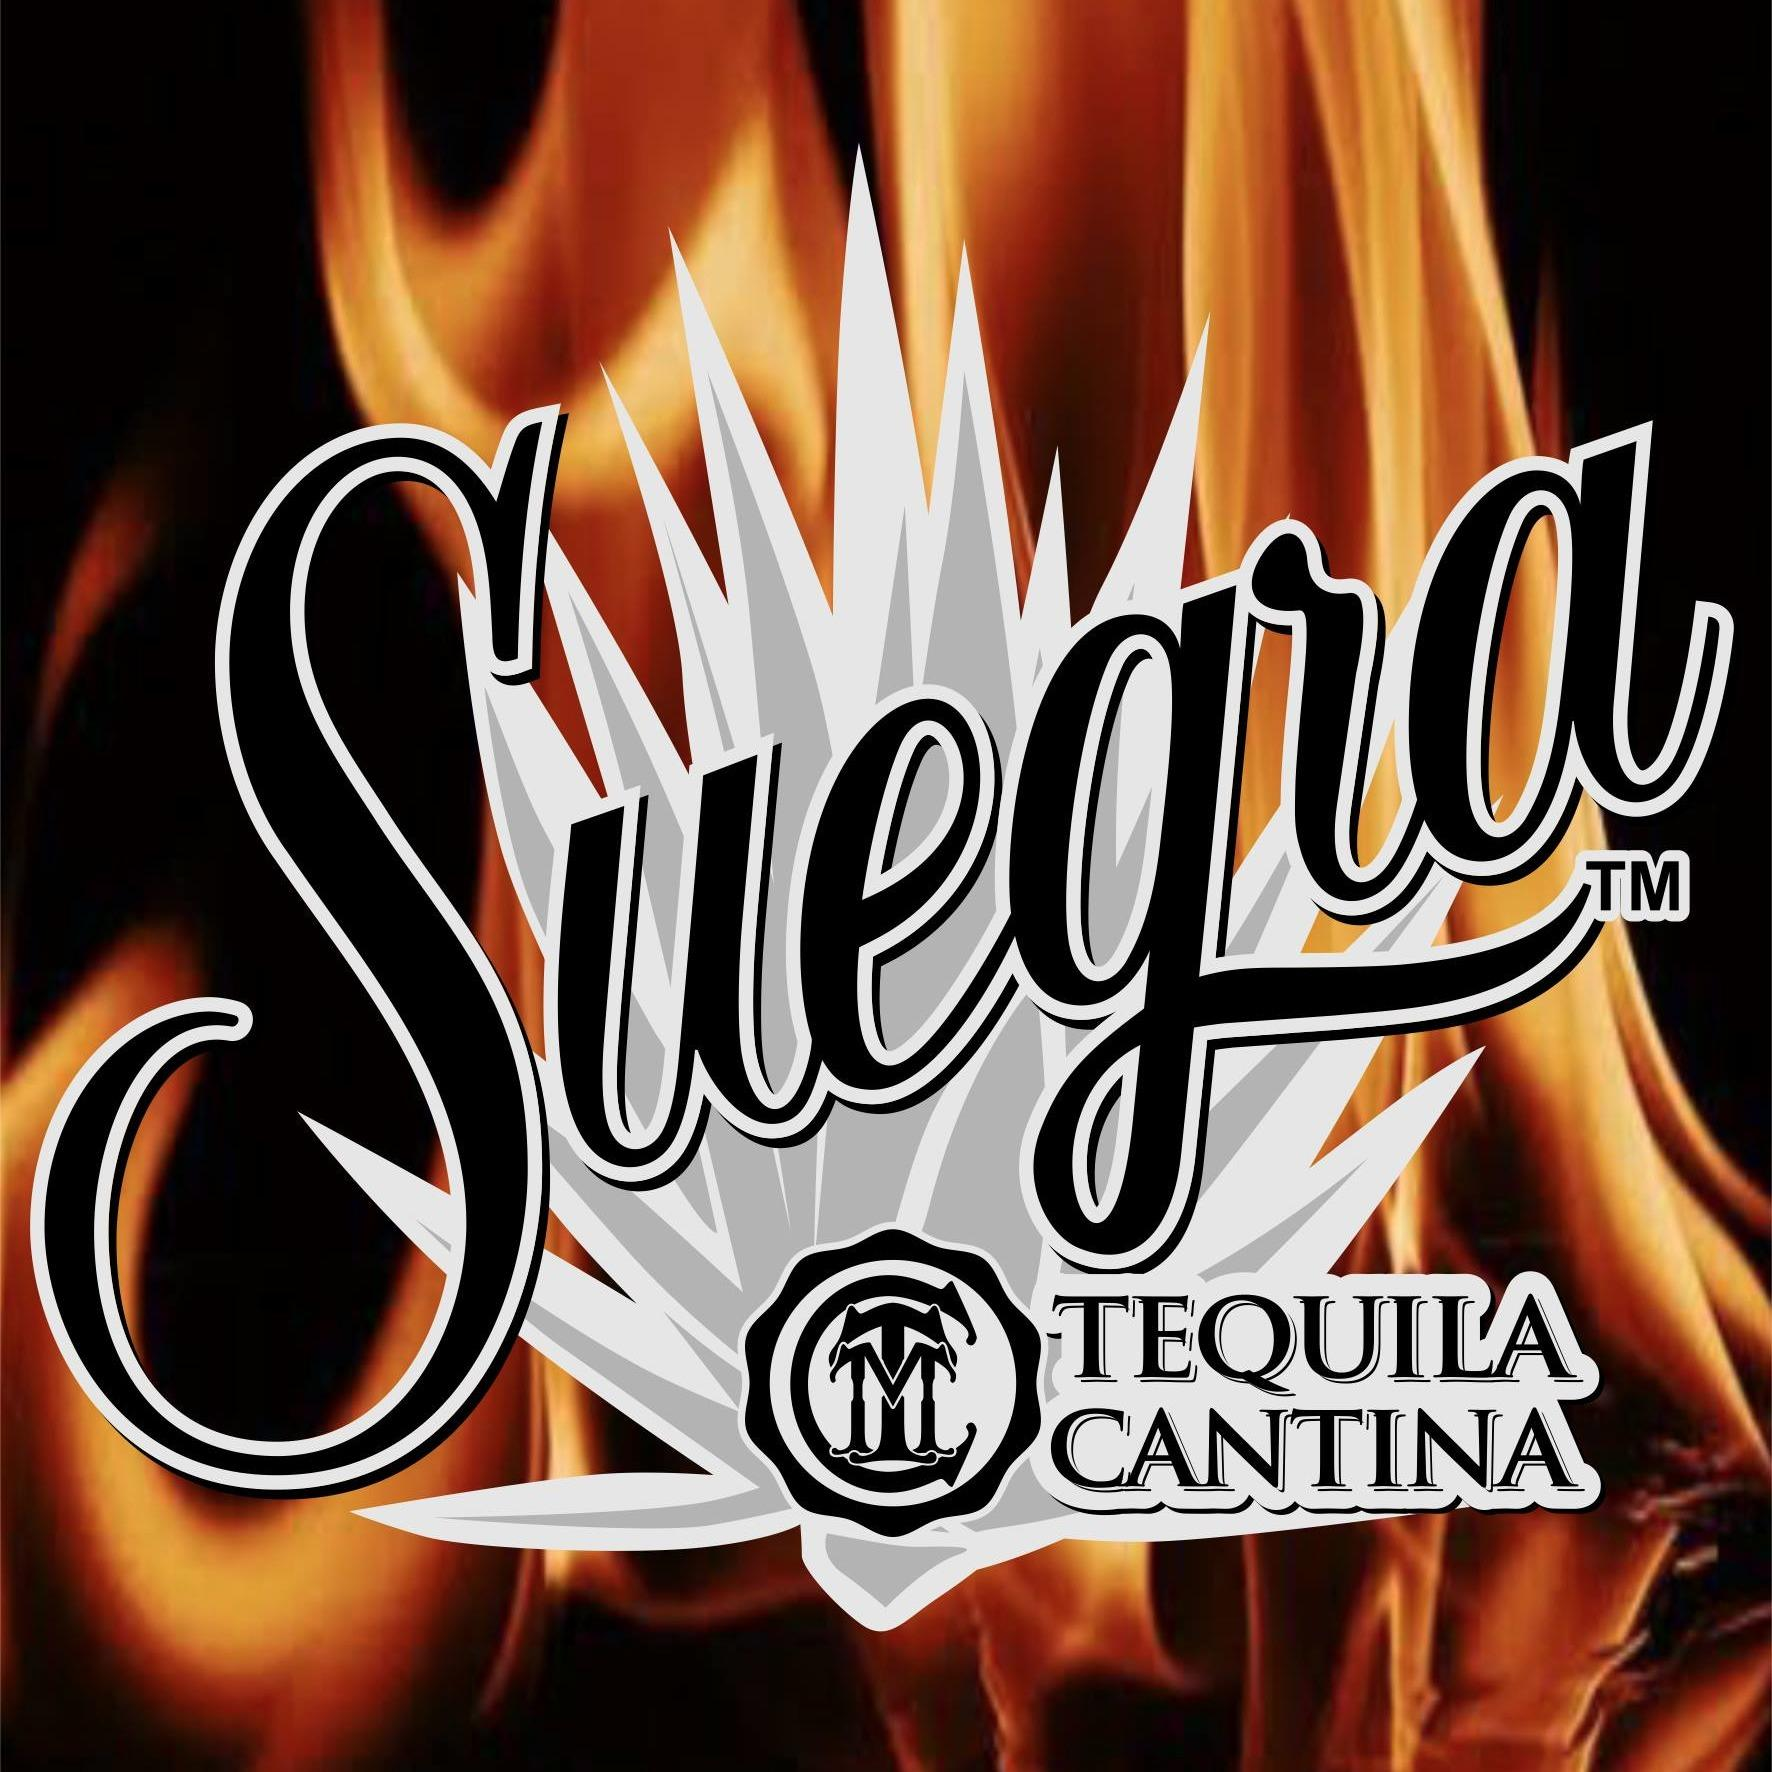 Suegra Tequila Cantina